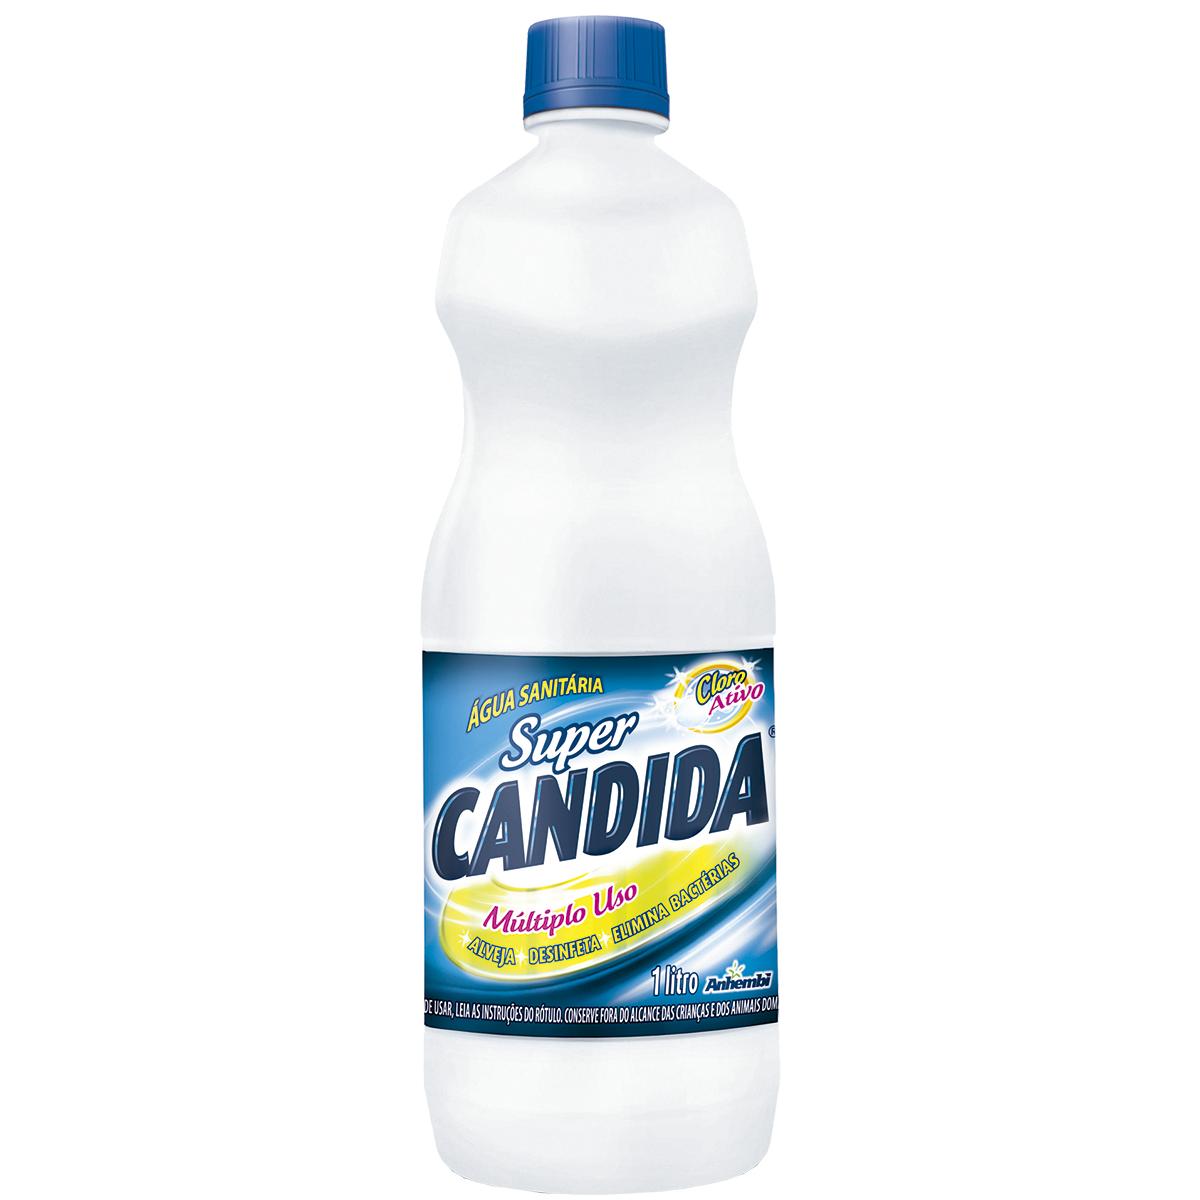 AGUA SANITARIA CLORO ATIVO 2,0 A 2,5% 1L SUPER CANDIDA